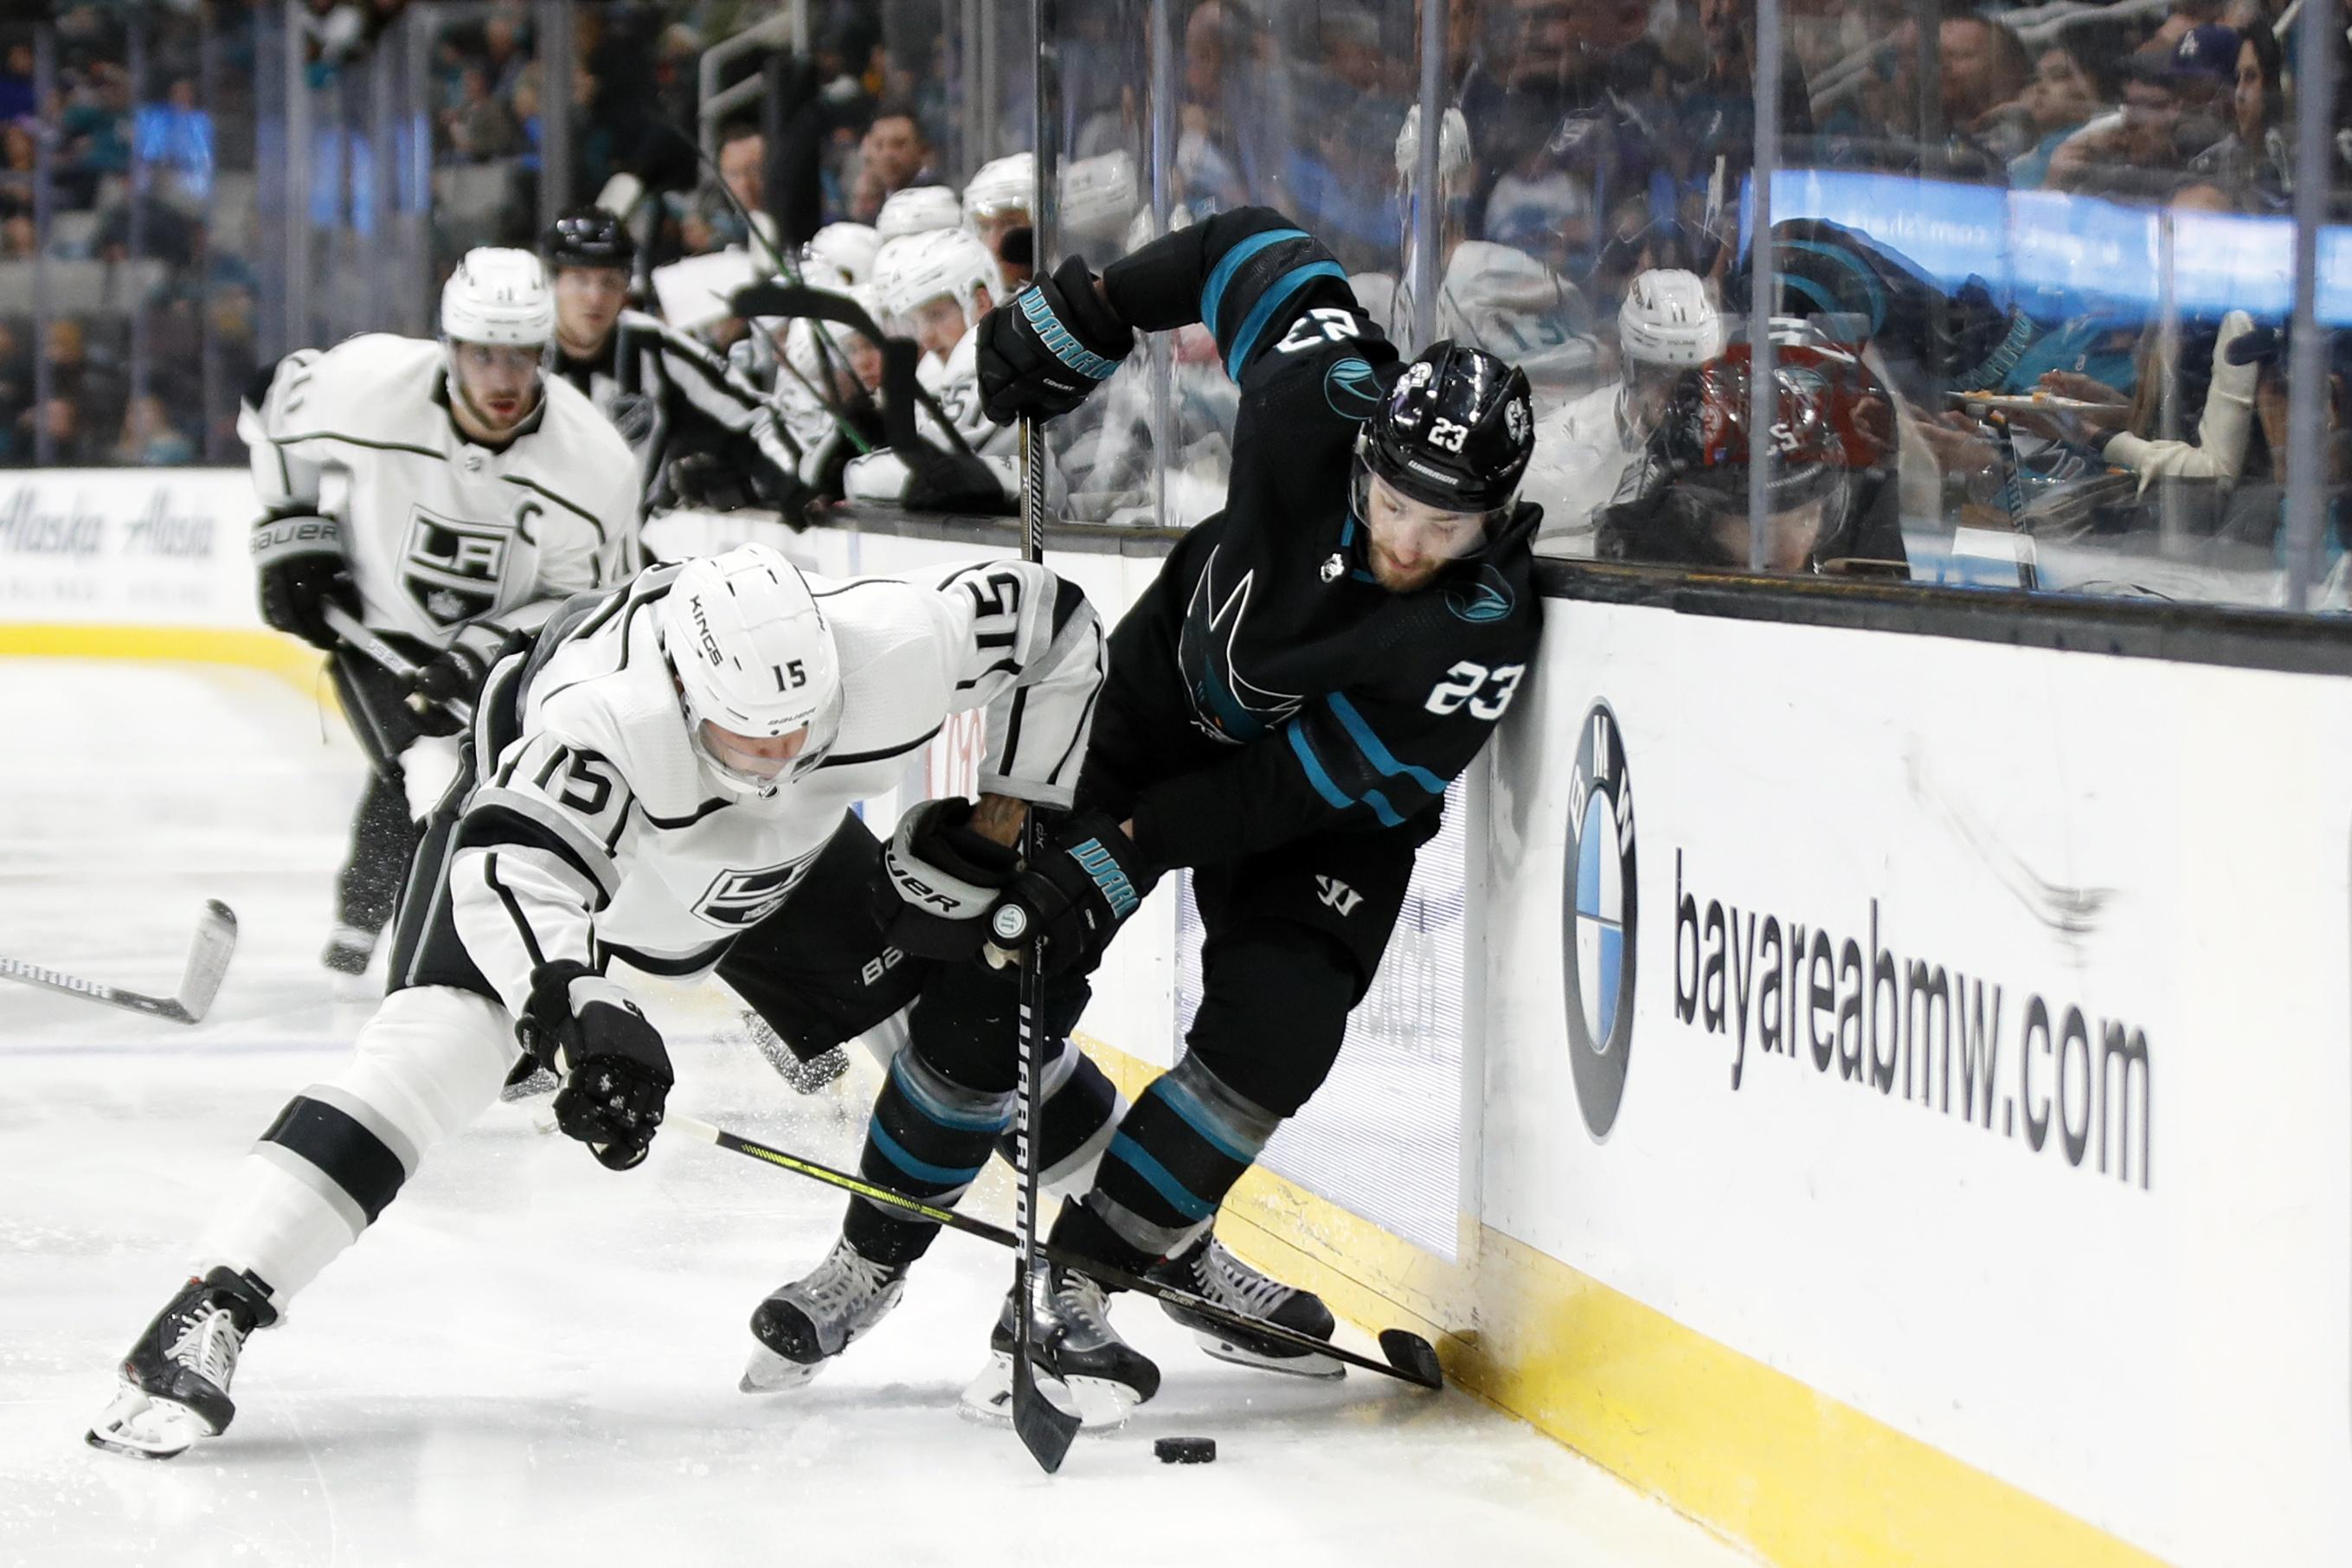 Nov 29, 2019; San Jose, CA, USA; Los Angeles Kings defenseman Ben Hutton (15) and San Jose Sharks center Barclay Goodrow (23) battle along the boards for the puck during the second period at SAP Center at San Jose.